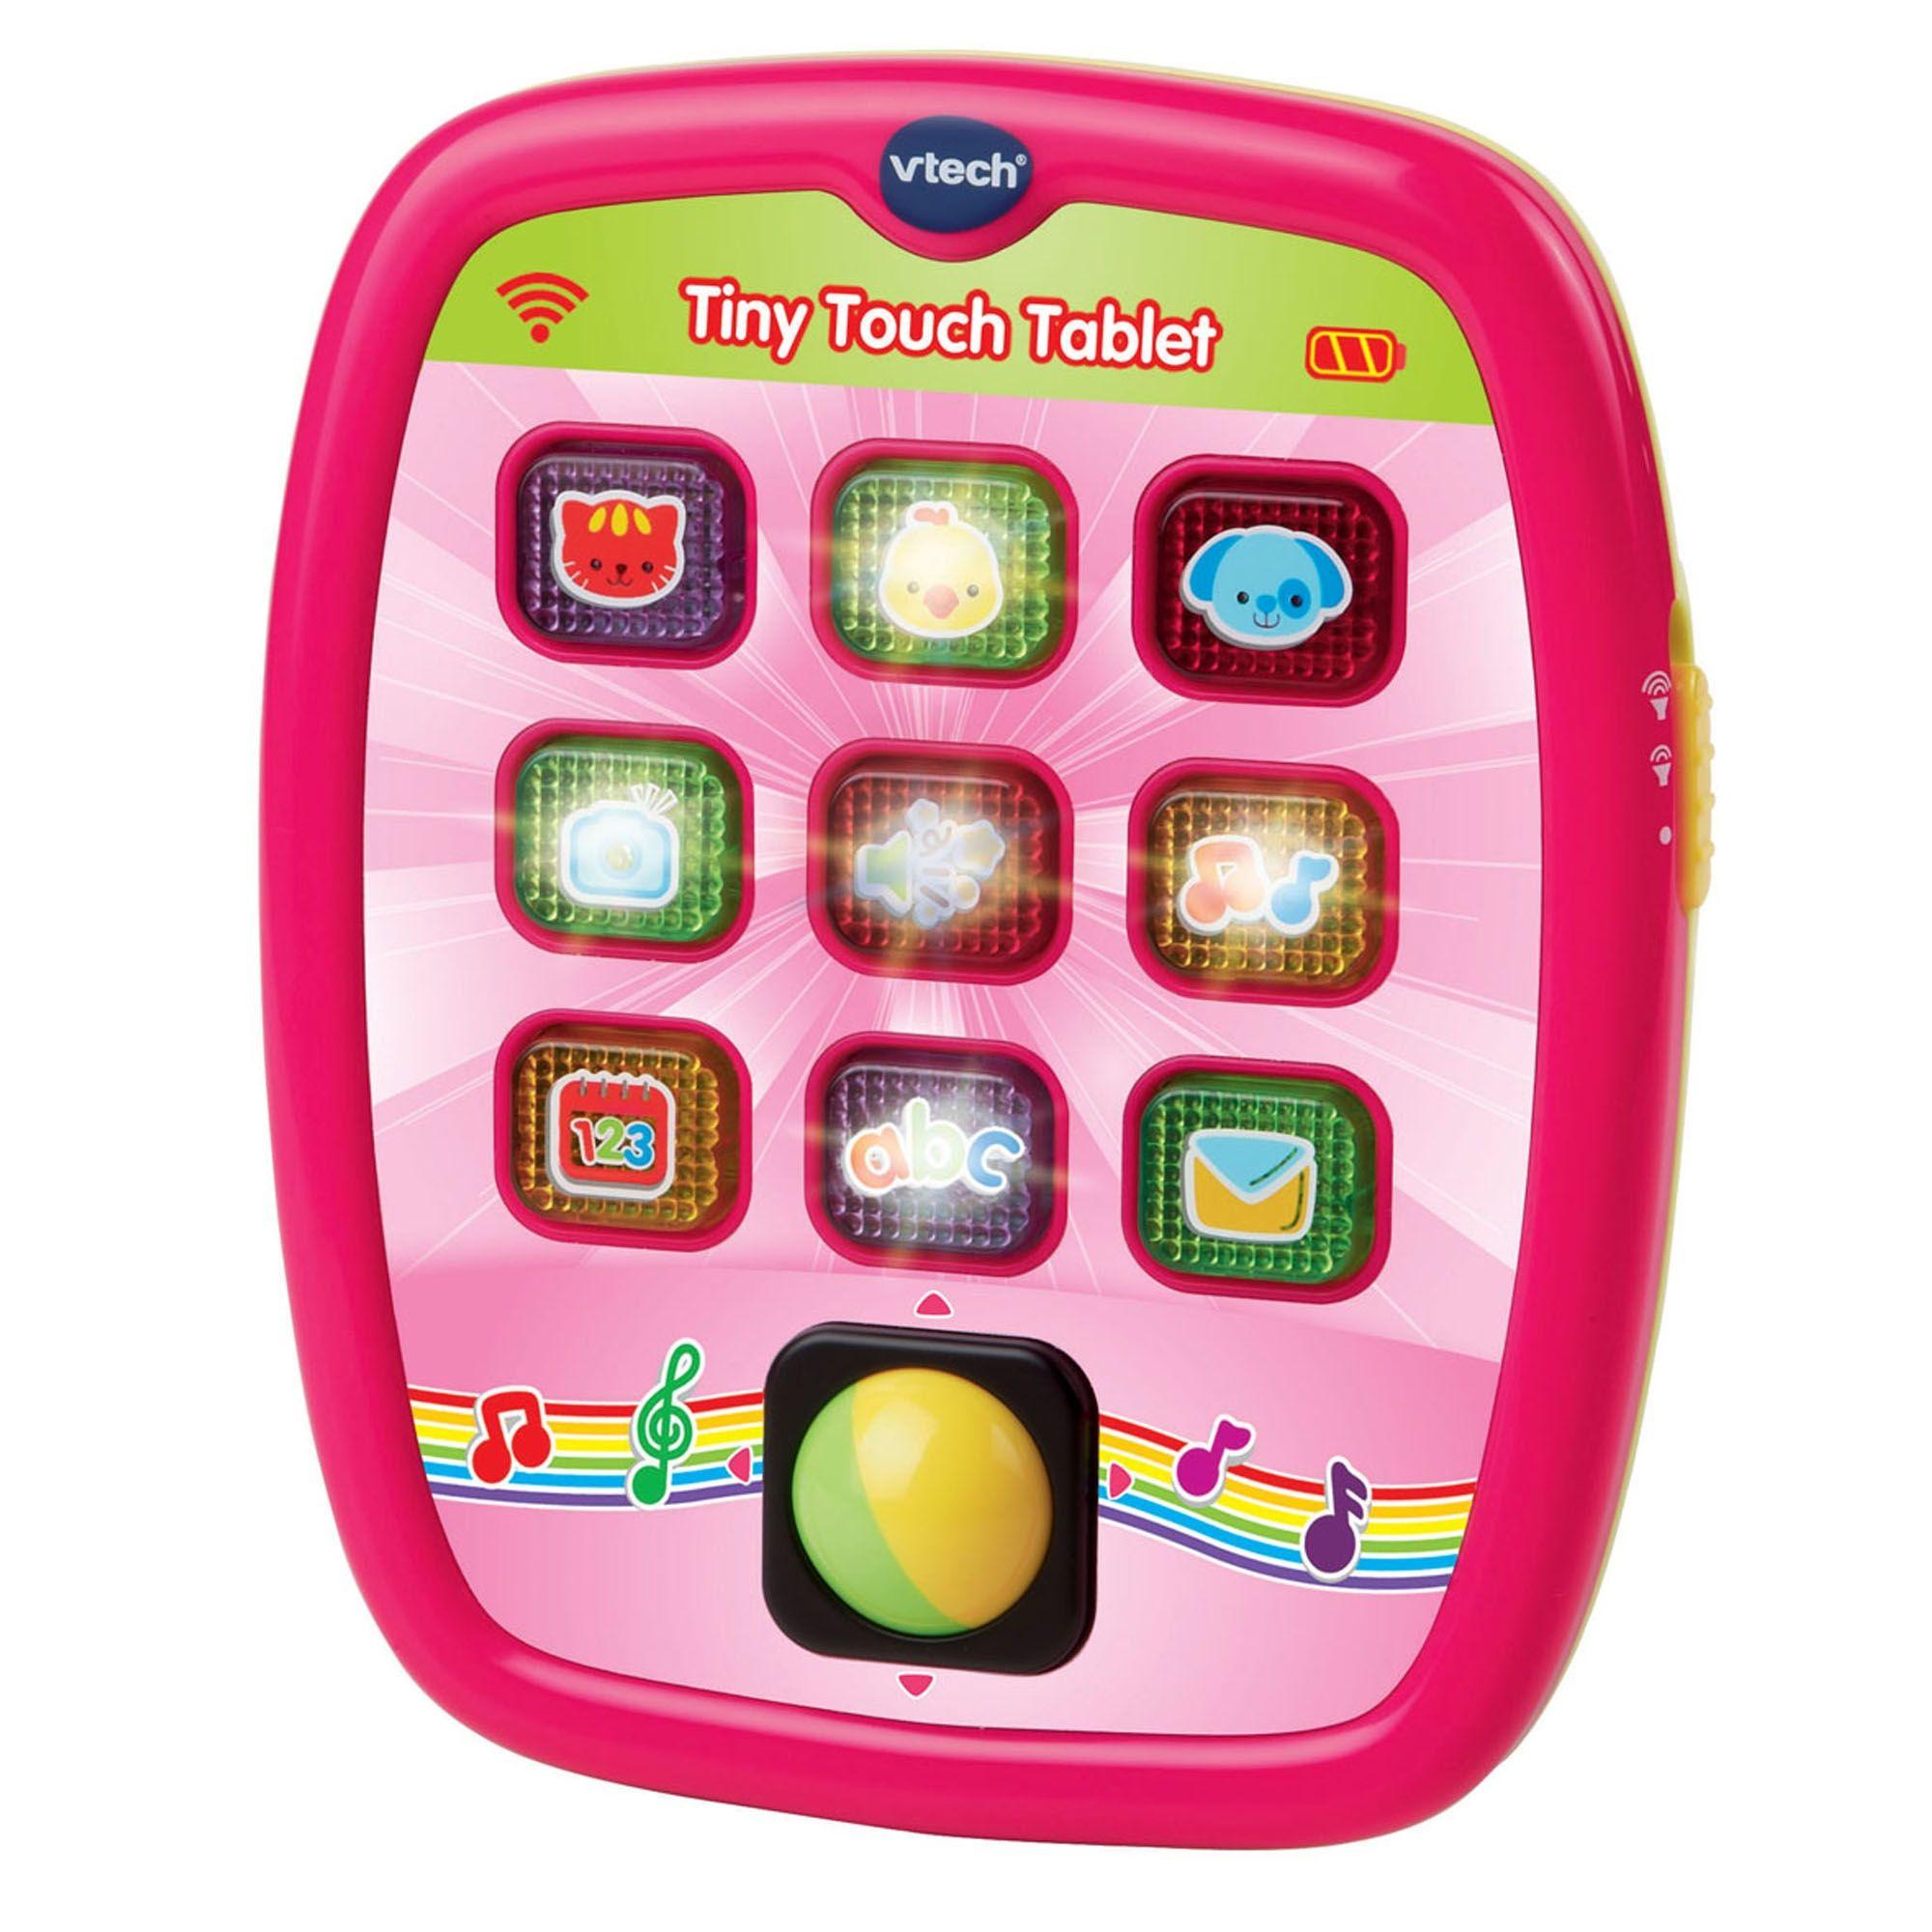 Resultado De Imágenes De Google Para Https Www Hamleys Com Images Lib Vtech Pink Tiny Touch Tablet 8829 0 Jpg Touch Tablet Vtech Baby Learning Tablet